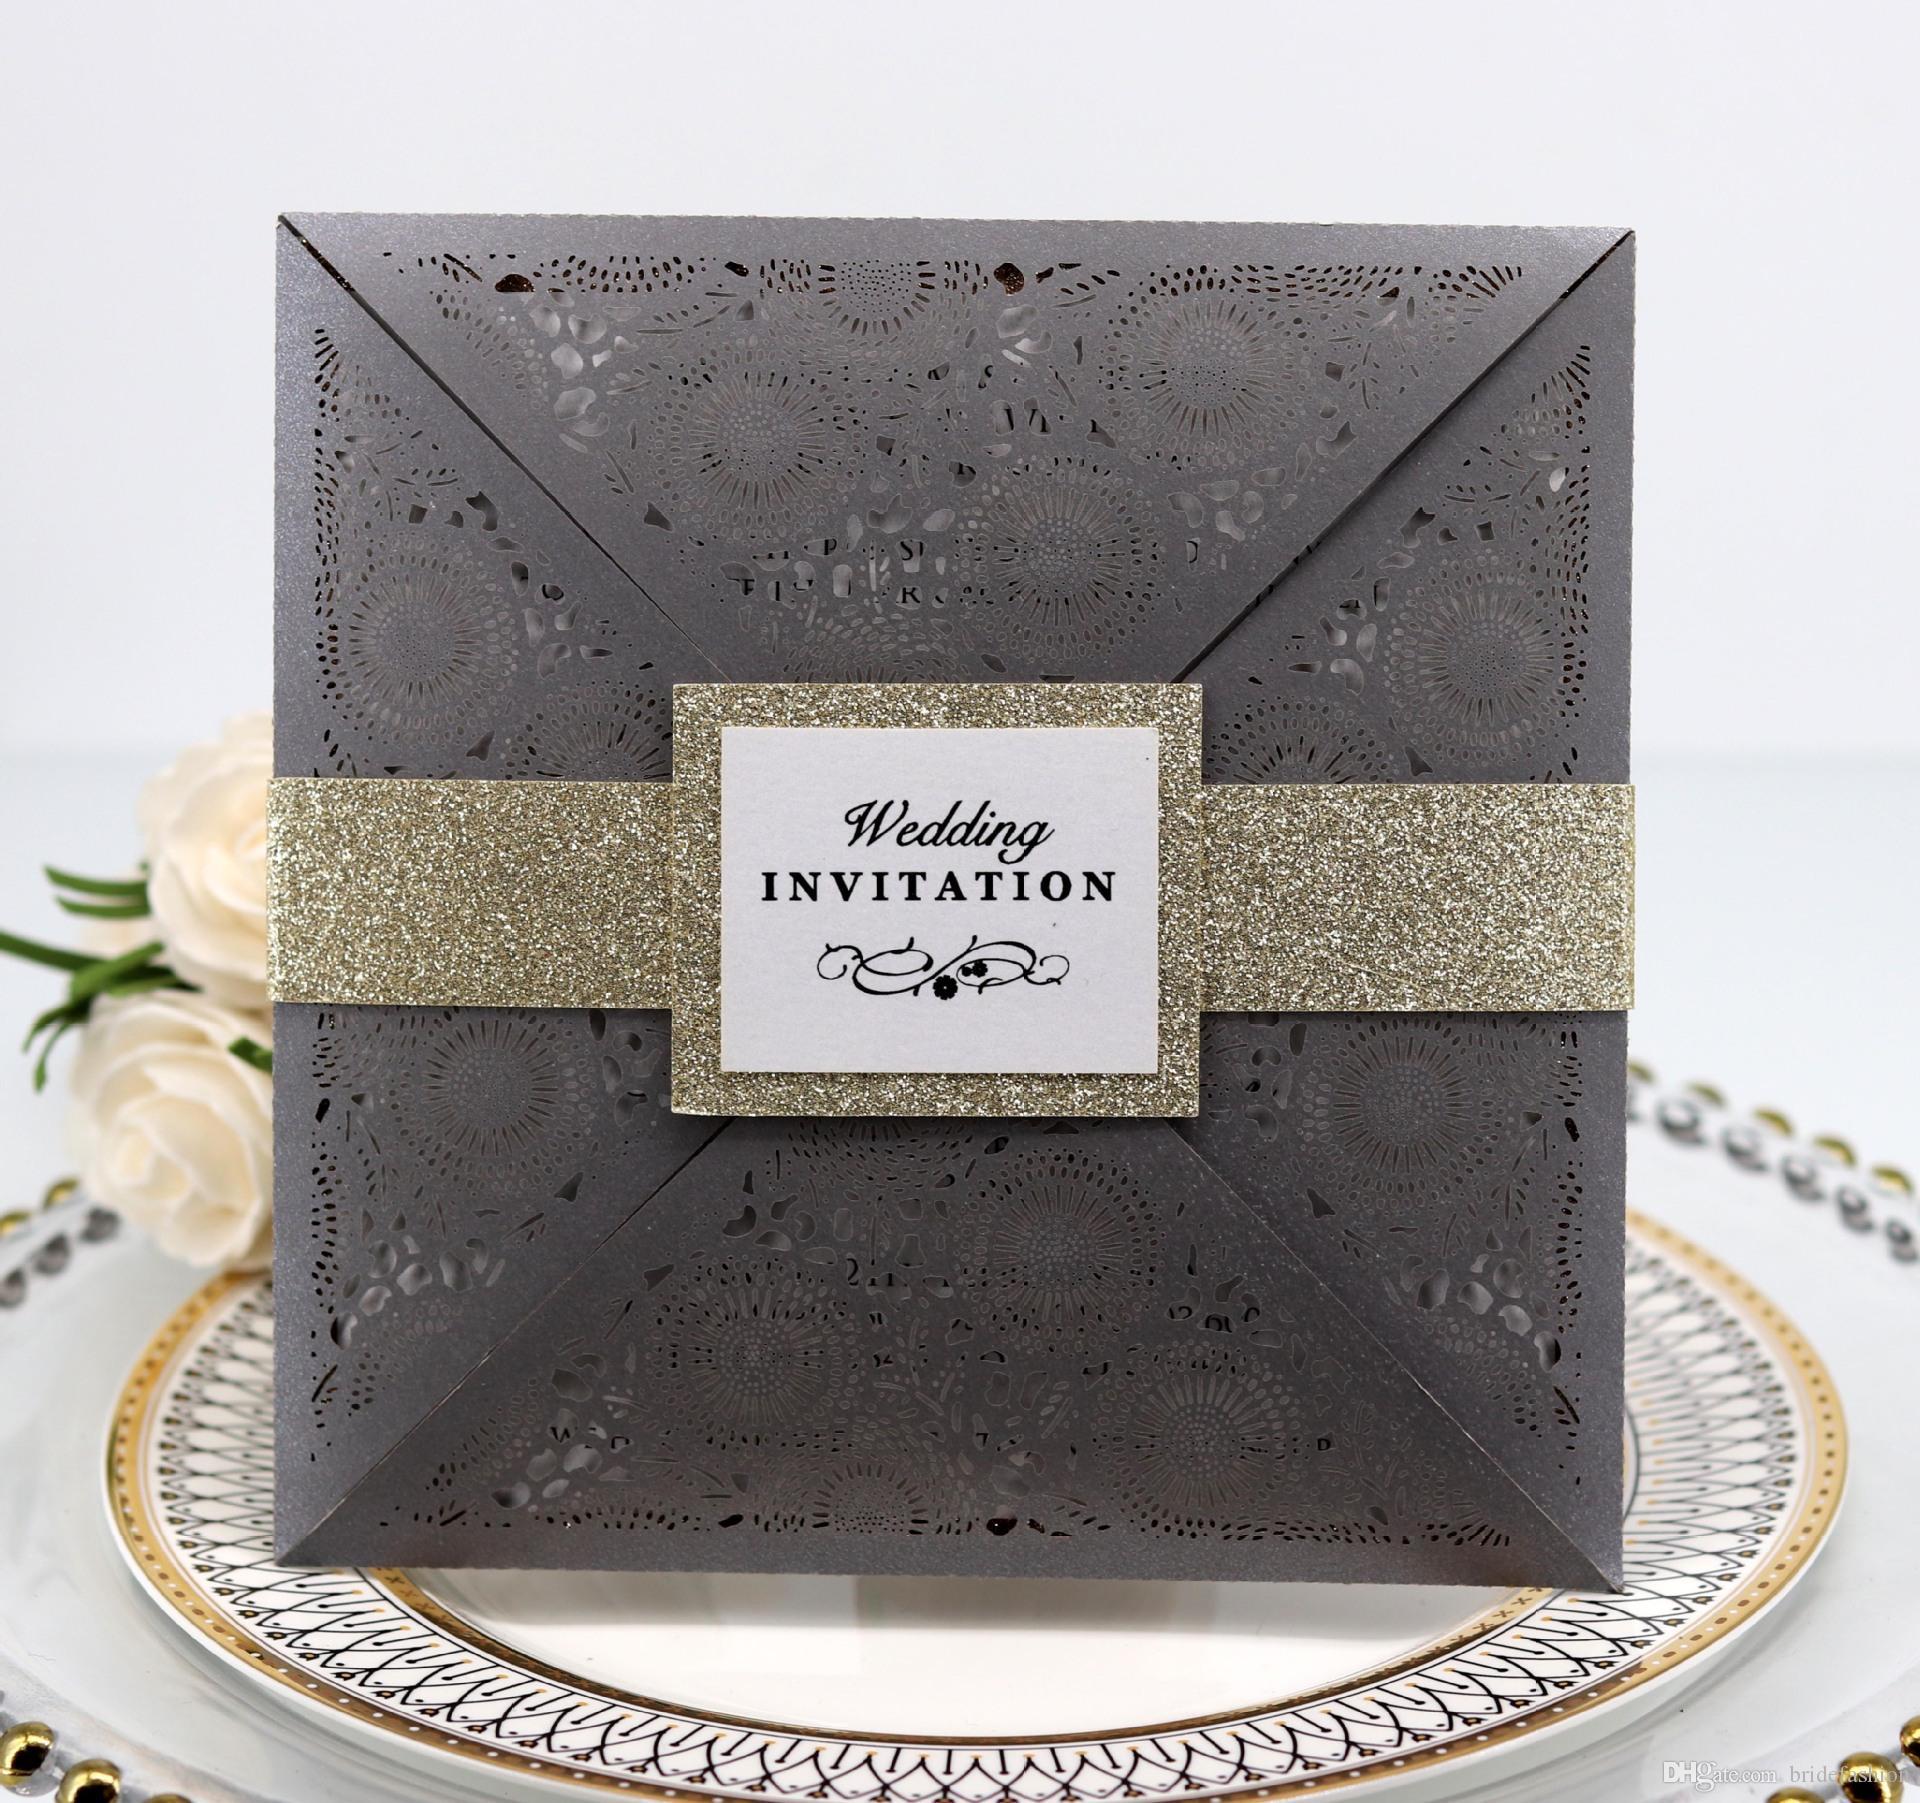 2019 Novos Convites De Casamento De Papel Em Branco Folha Interna Corte A Laser De Casamento Convite Flores Oco Cartões de Casamento Convite de Noivado